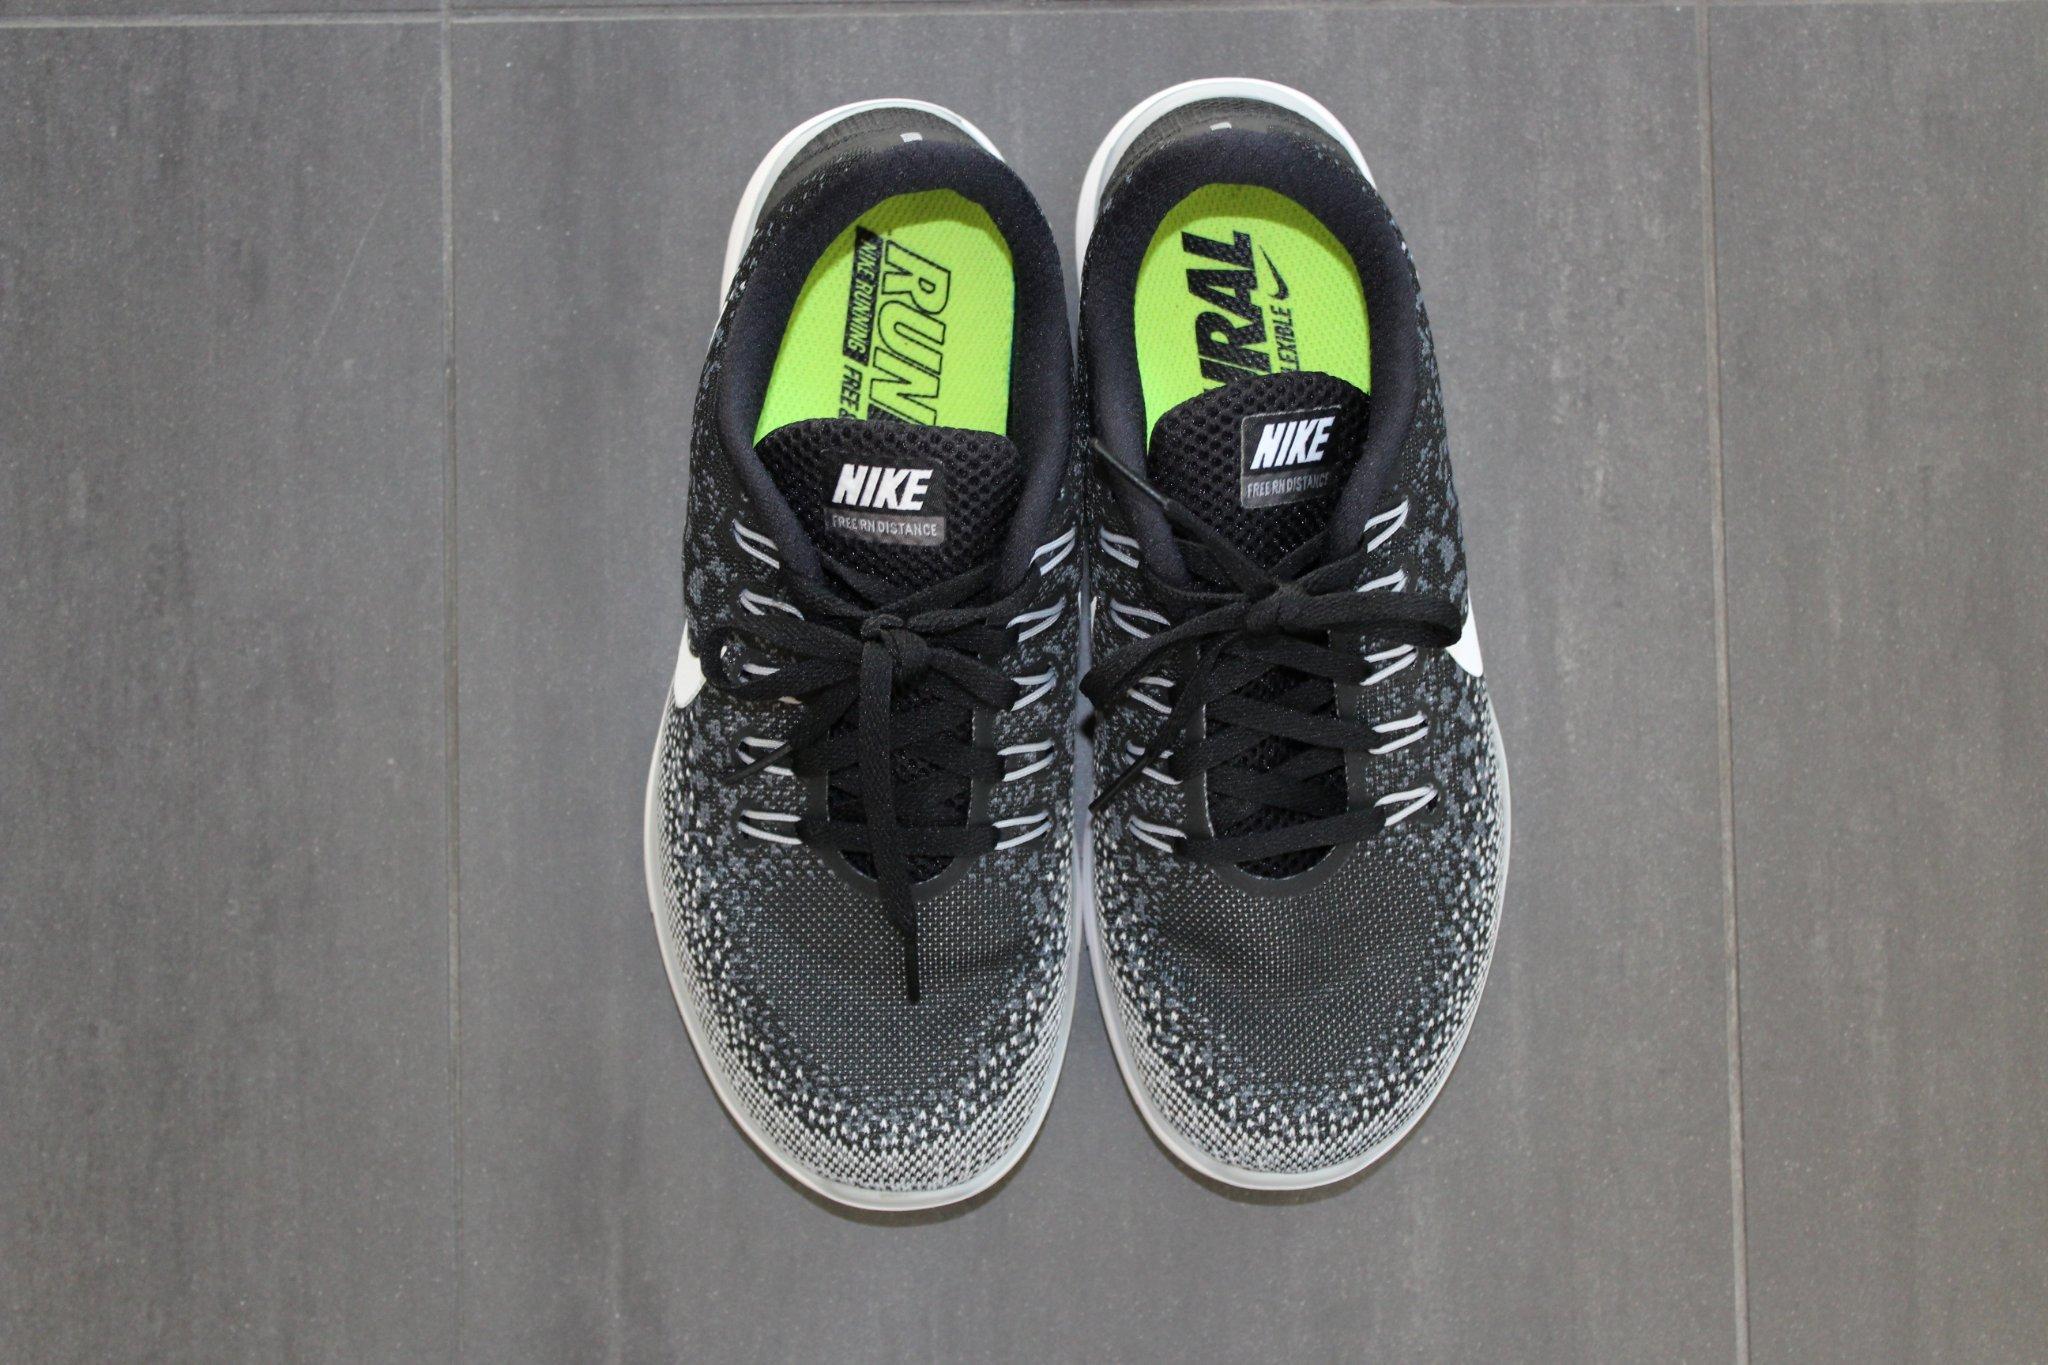 brand new 6871f 1d745 Nike - Free Run Skor - Svart Gråa - Storlek  37,5 -